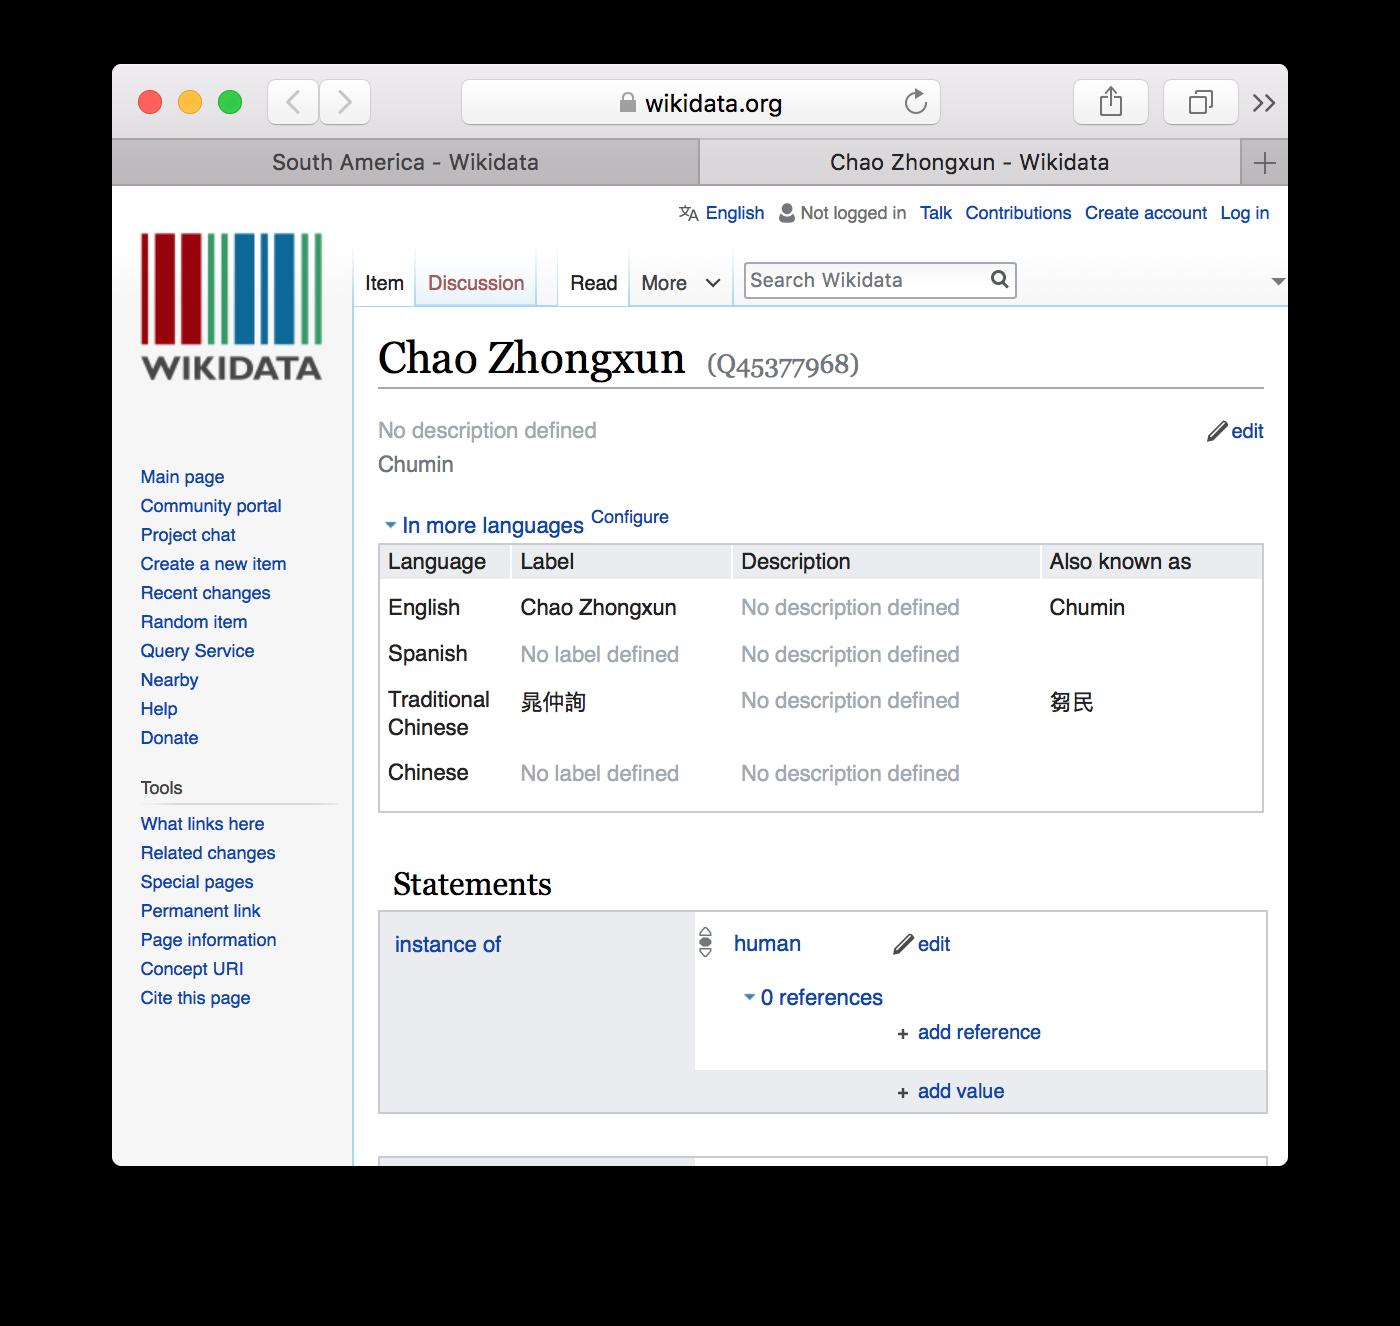 Wikidata page for Chao Zhongxun